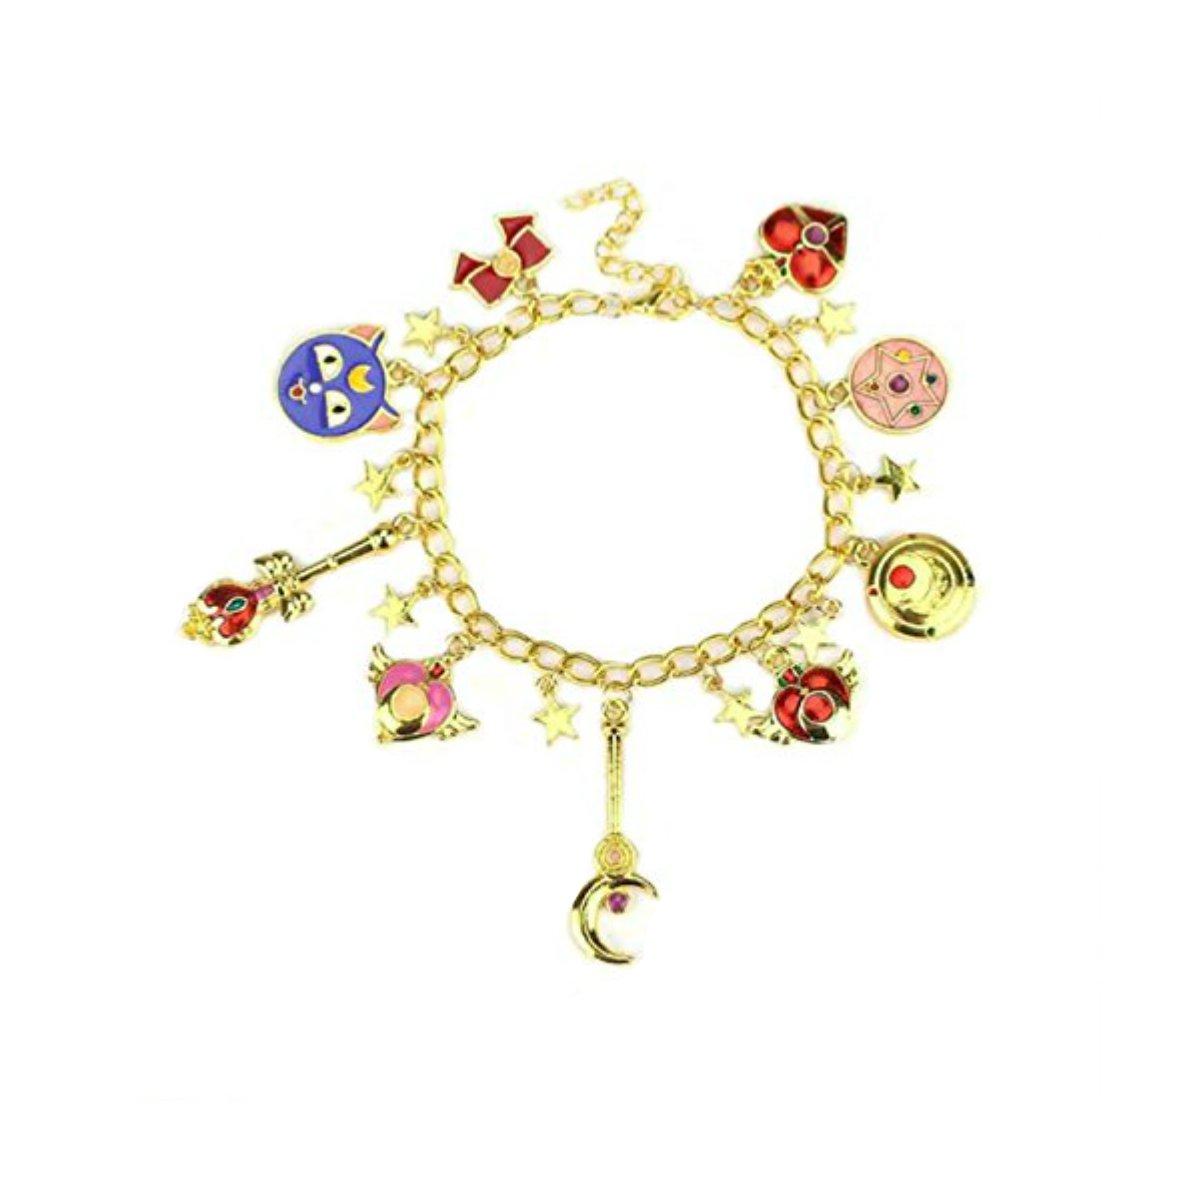 US FAMILY Sailor Moon Manga Anime Theme Multi Charms Jewelry Bracelets Charm by Family Brands